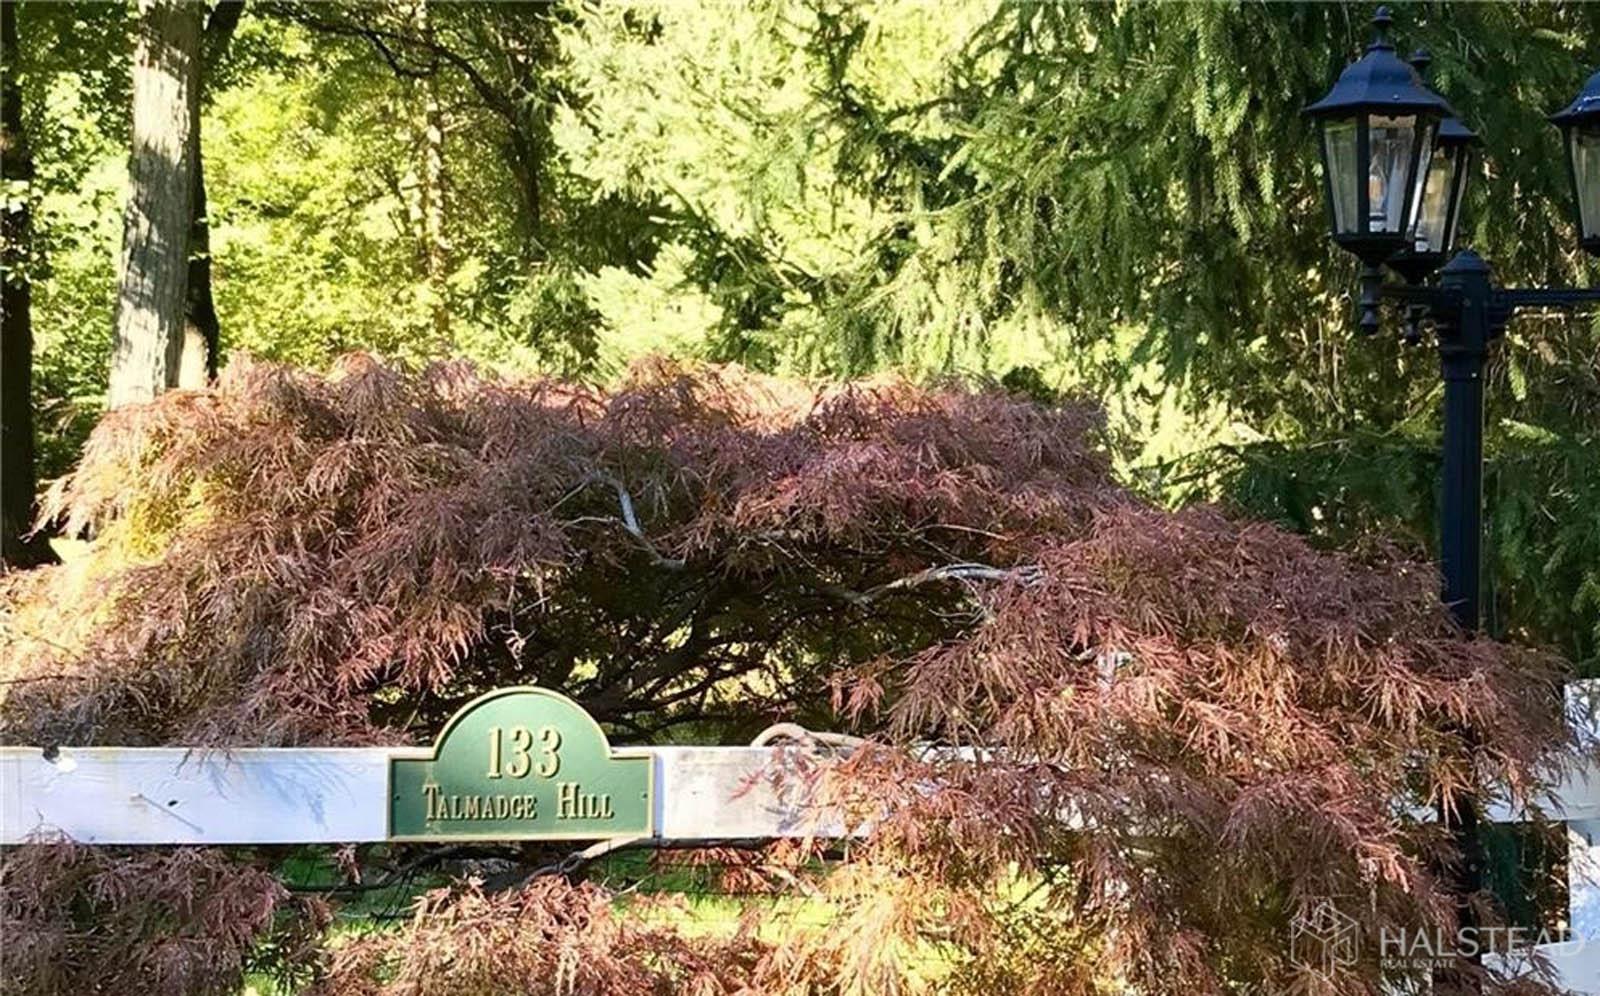 133 TALMADGE HILL ROAD, New Canaan, $1,195,000, Web #: 170296898